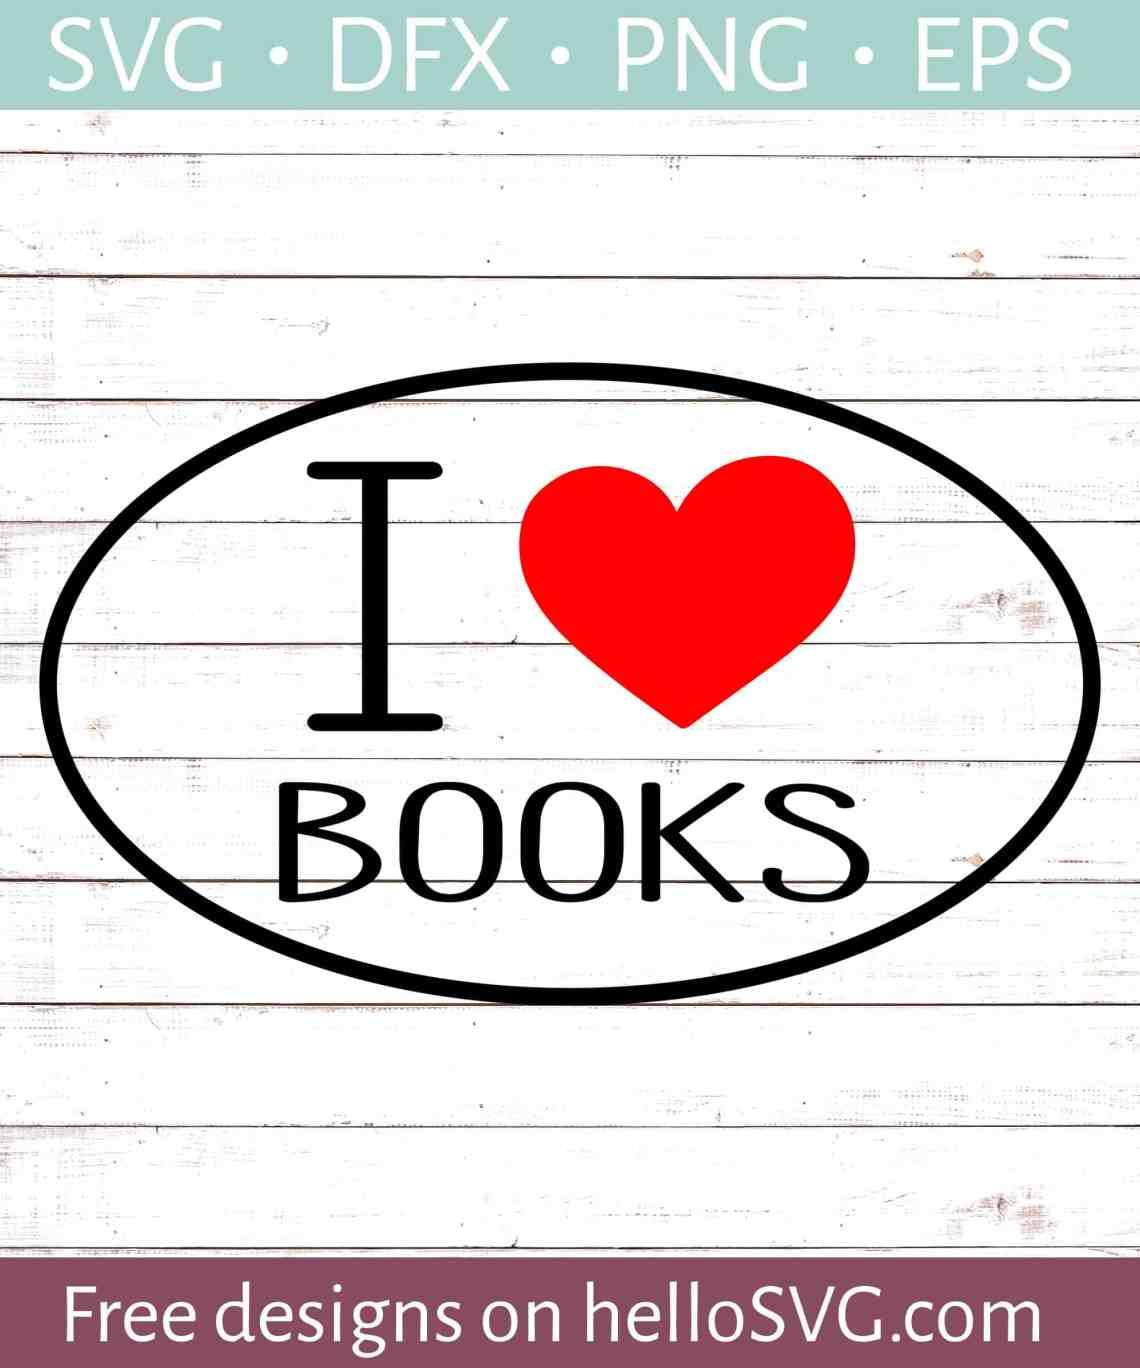 Download I Love Books SVG - Free SVG files | HelloSVG.com